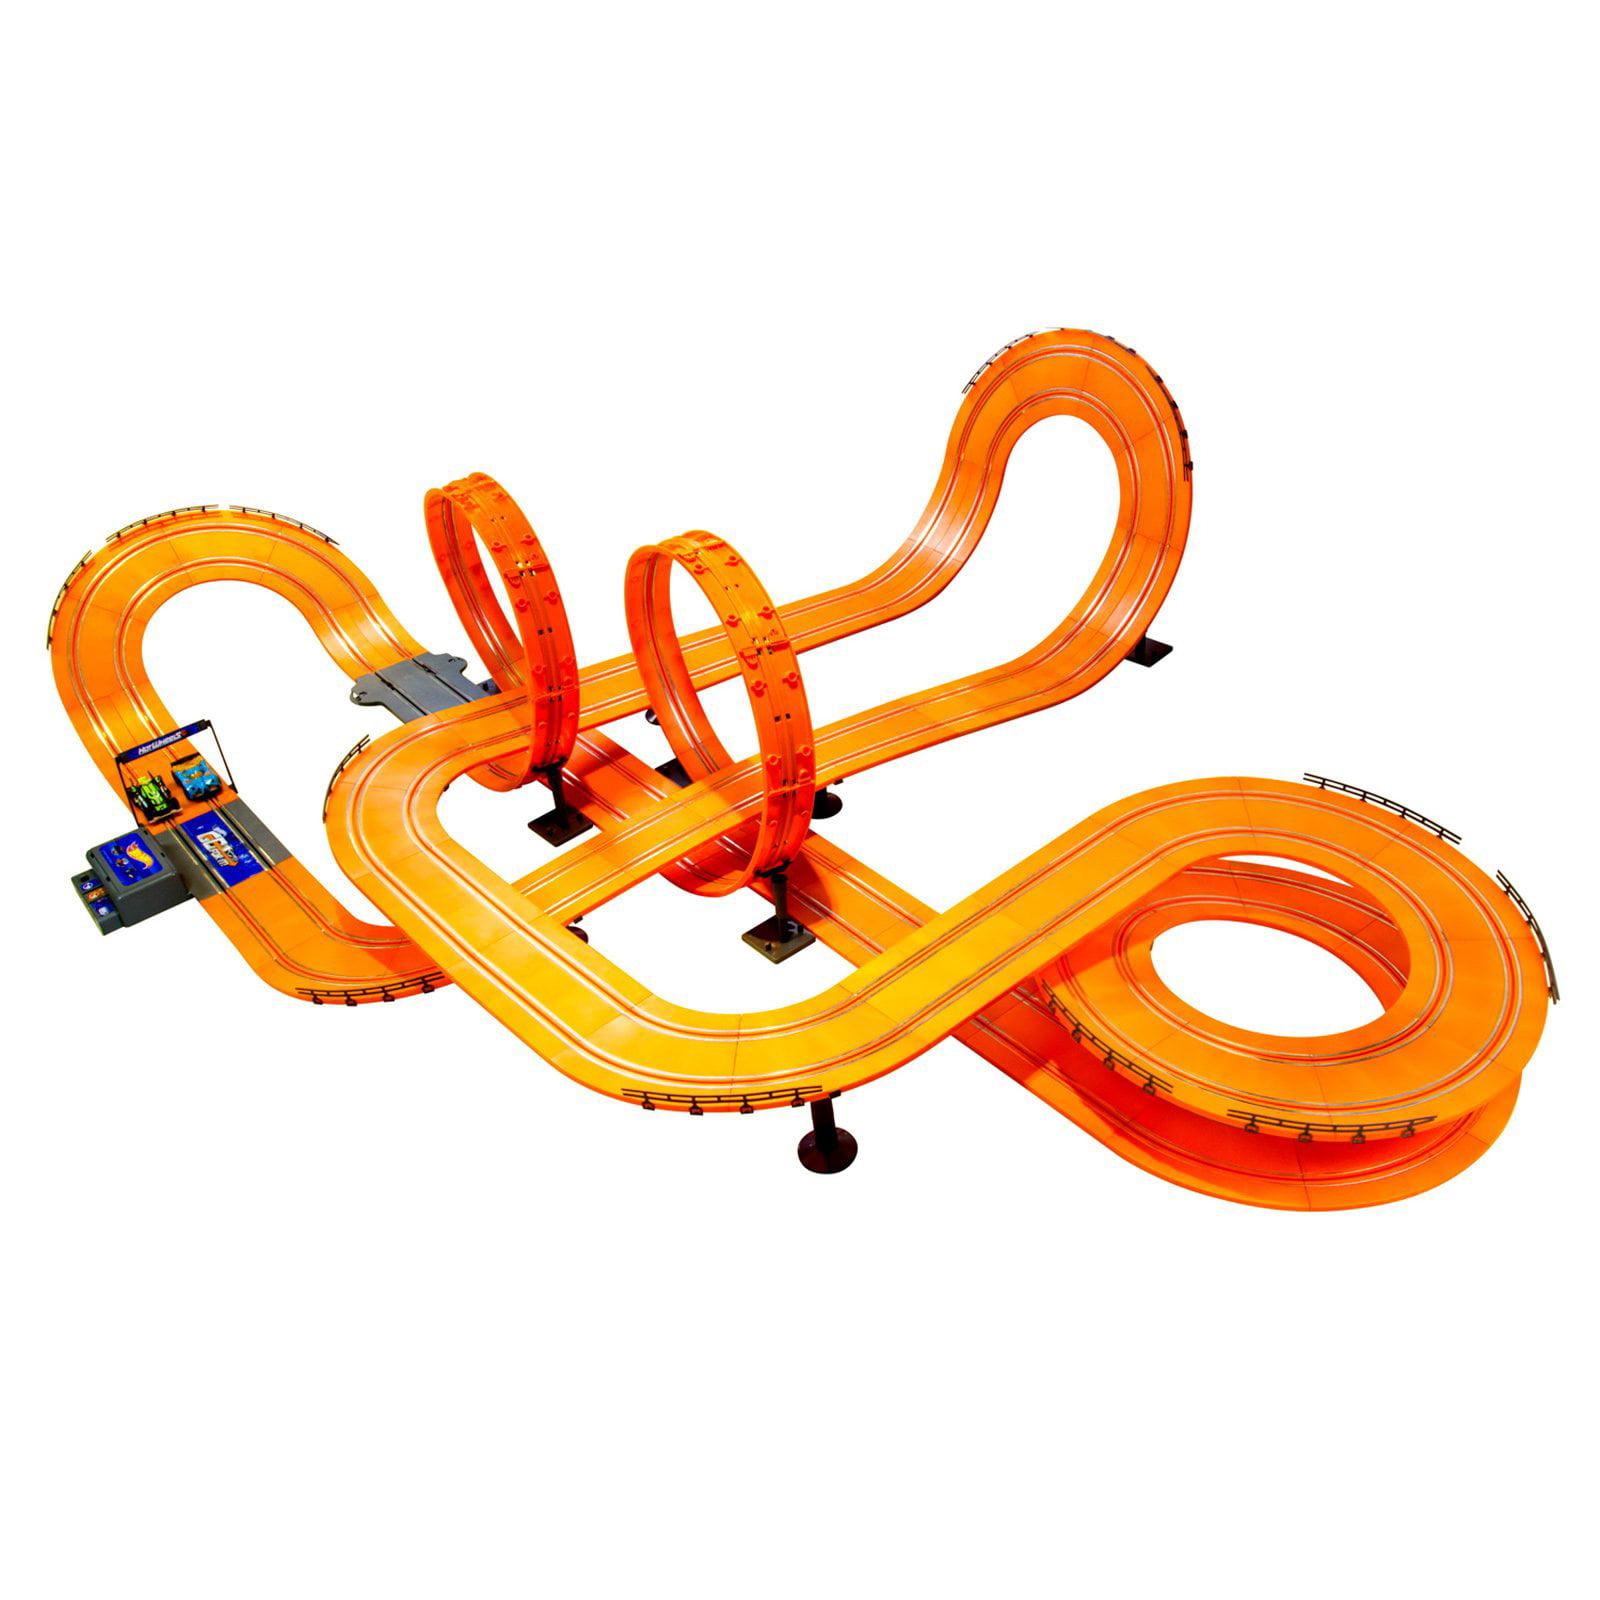 Hot Wheels Electric 42.6 ft. Slot Track by Kidz Tech